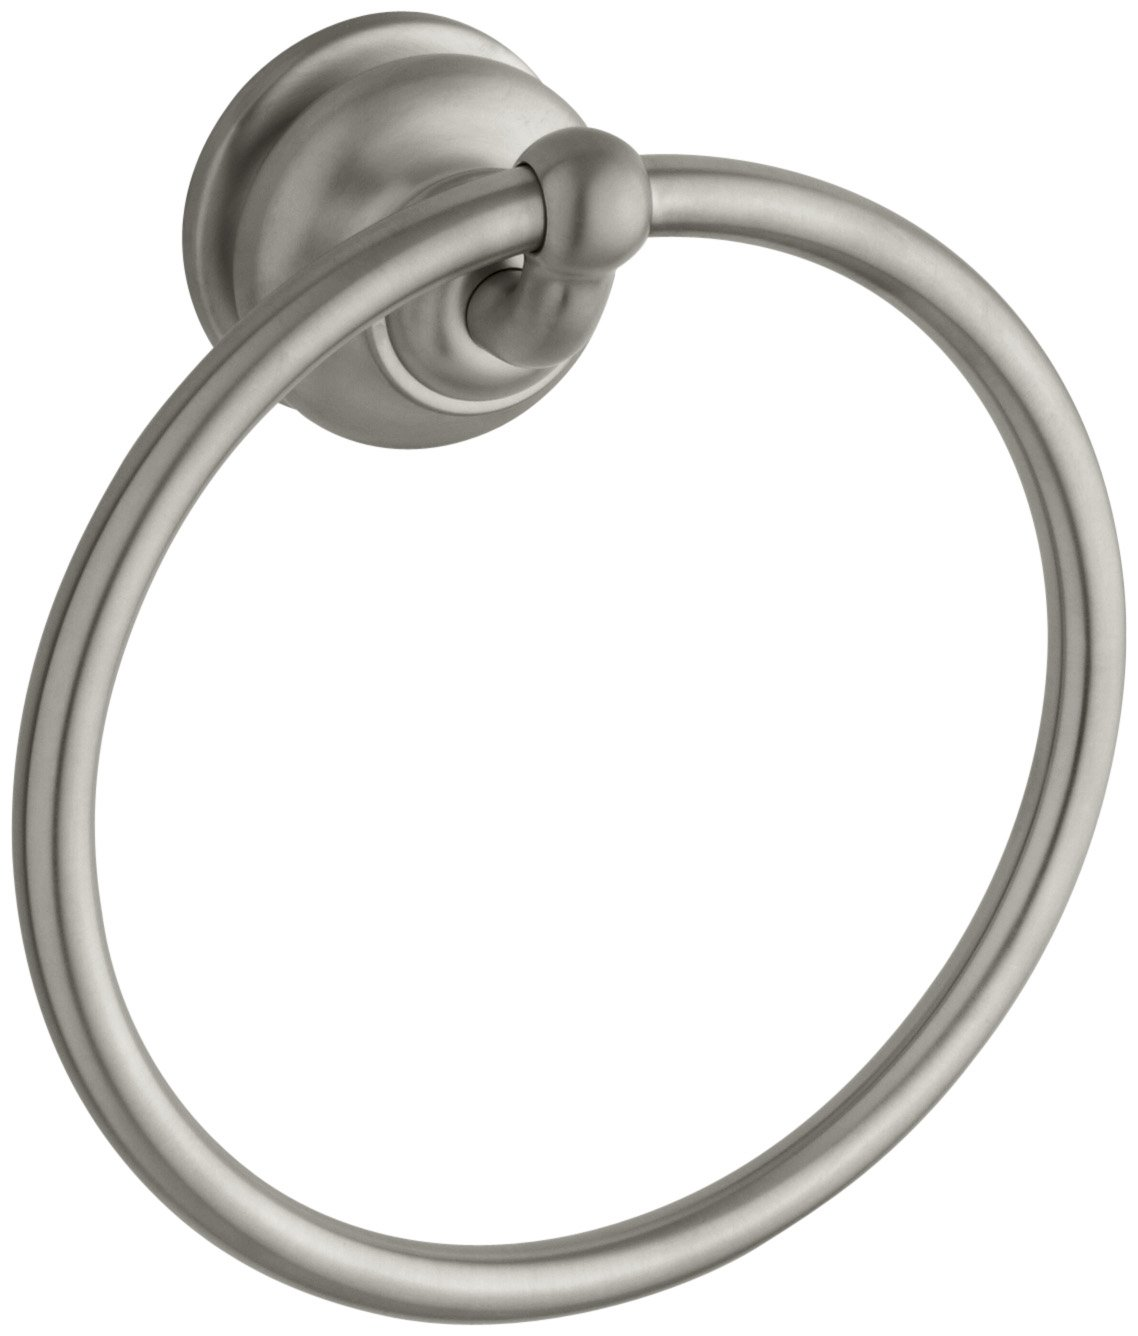 KOHLER K-12165-BN Fairfax Bathroom Towel Ring, Vibrant Brushed Nickel